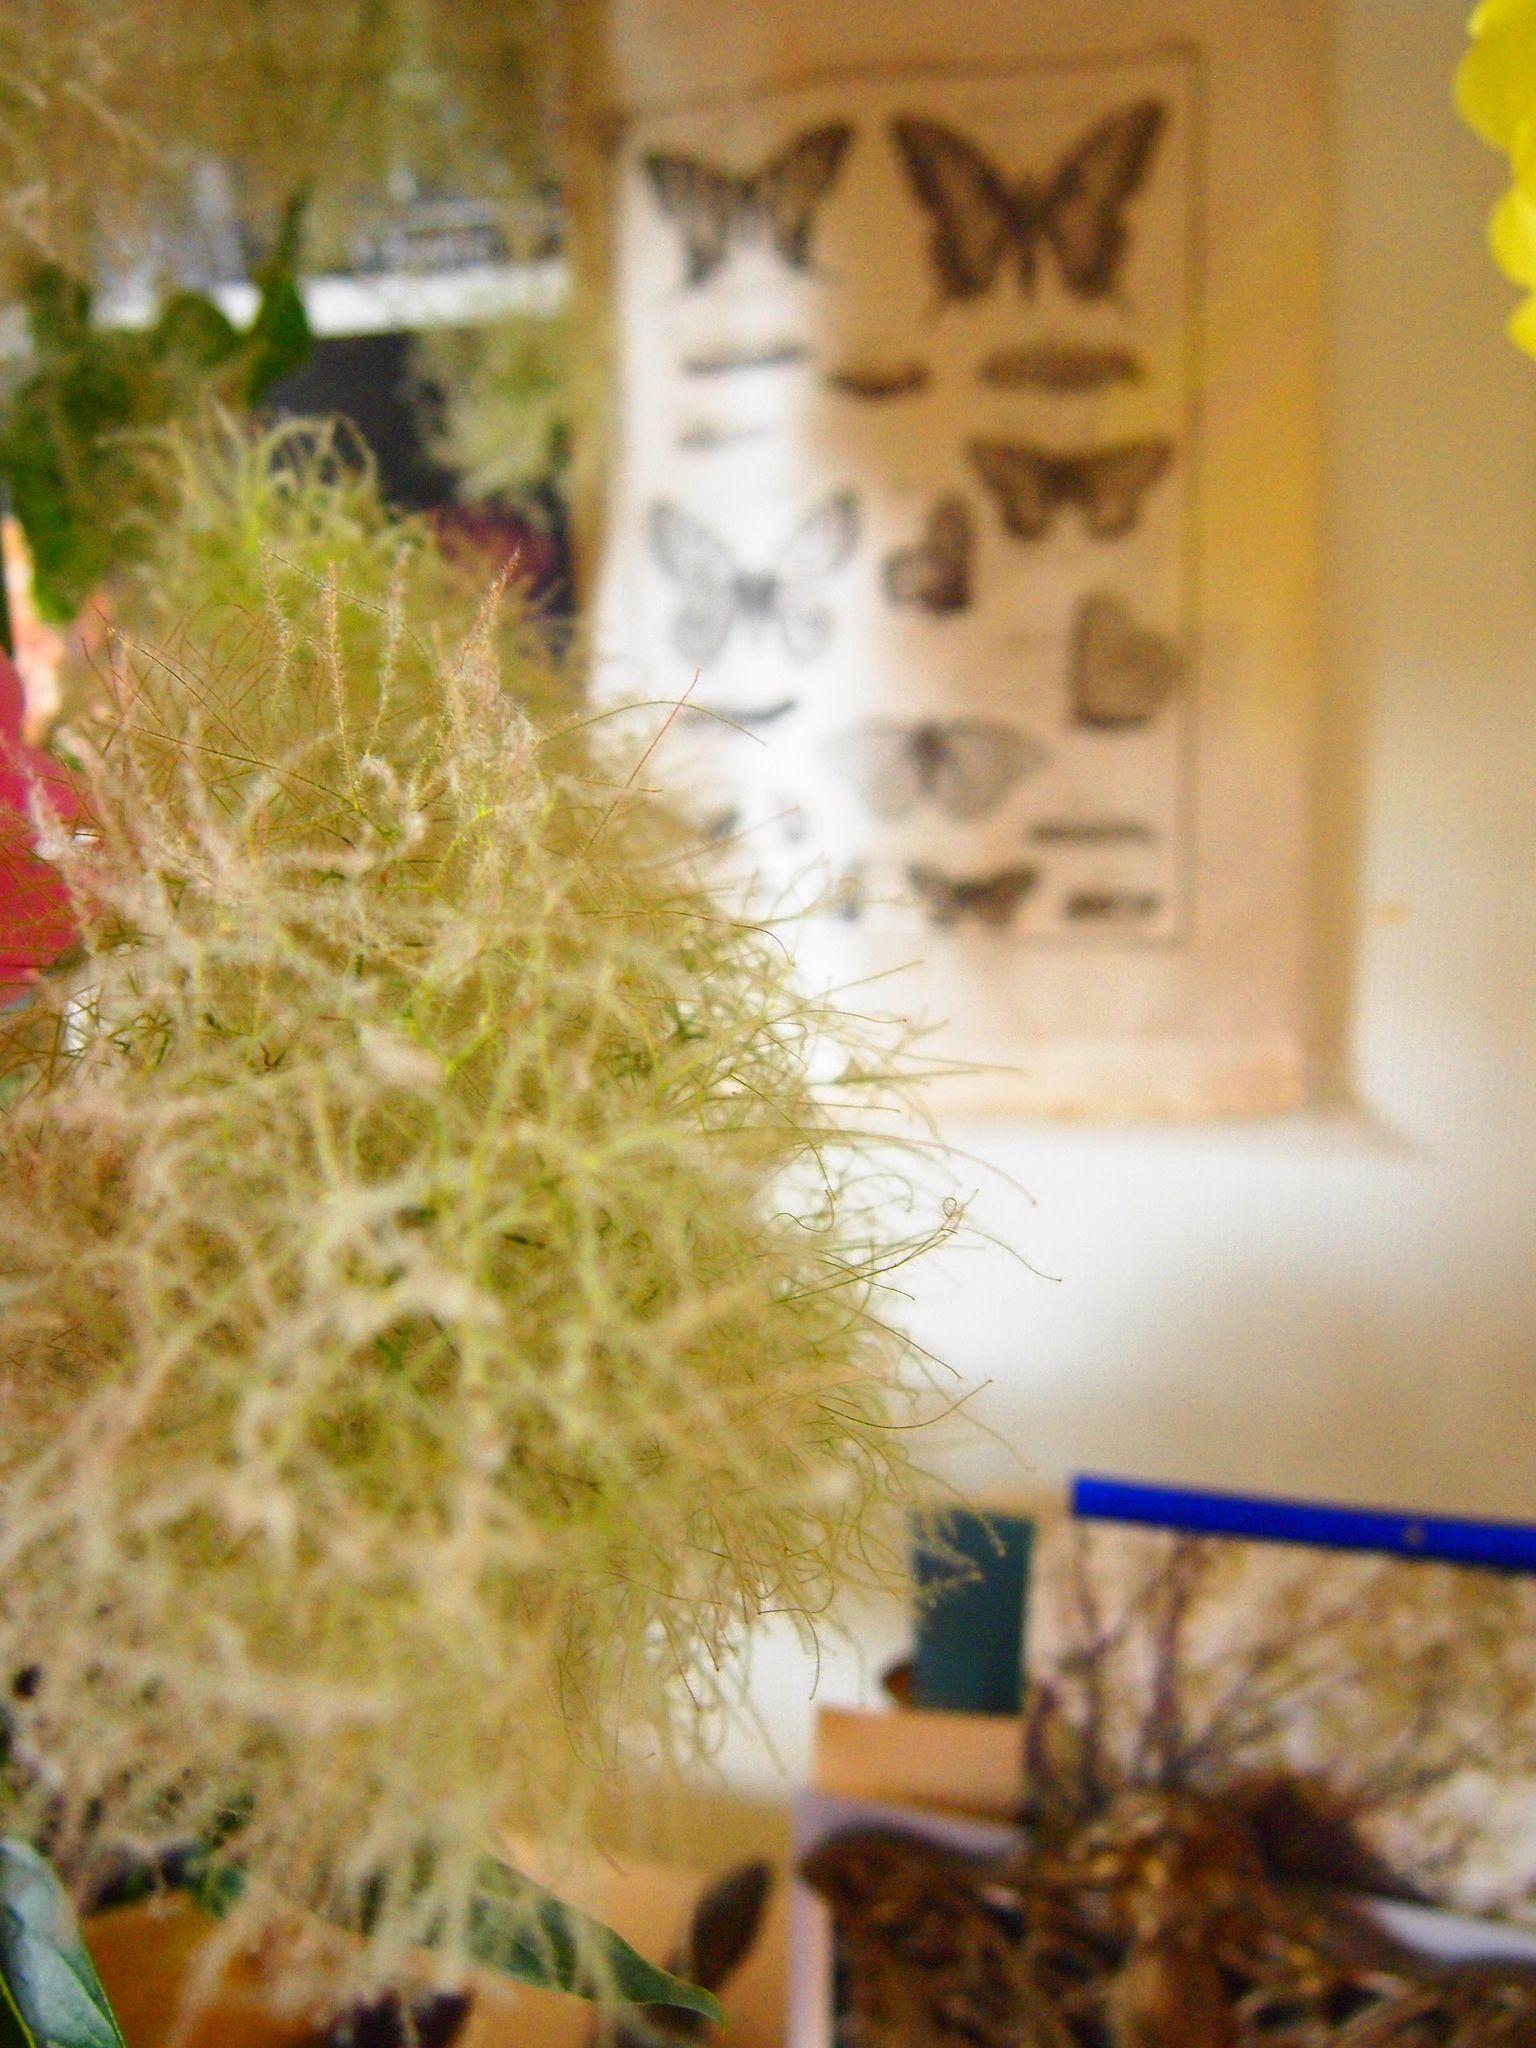 https://flic.kr/p/eMqrqH | papillon,smoked tree | OLYMPUS DIGITAL CAMERA